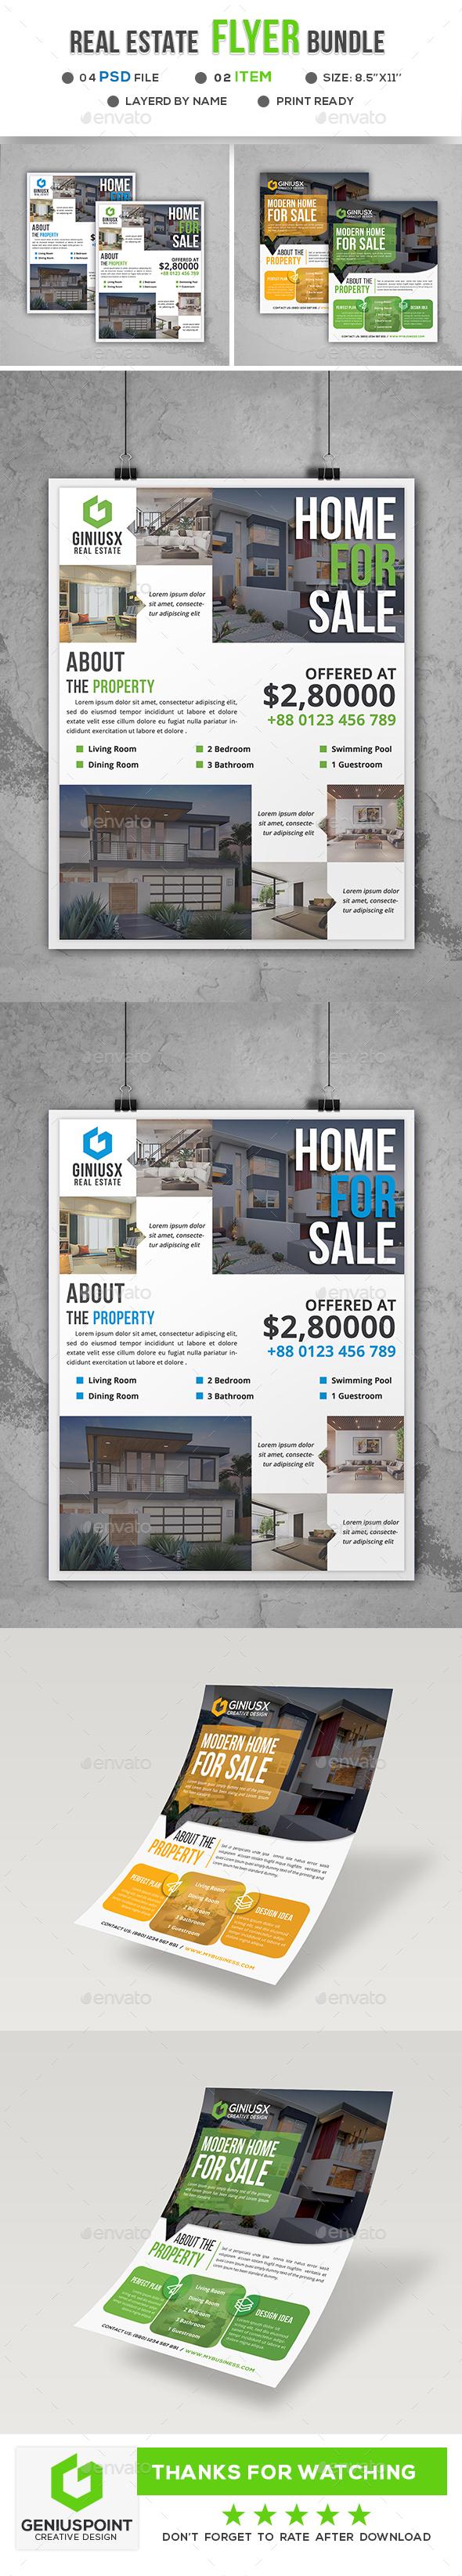 Real Estate Flyer Bundle - Flyers Print Templates